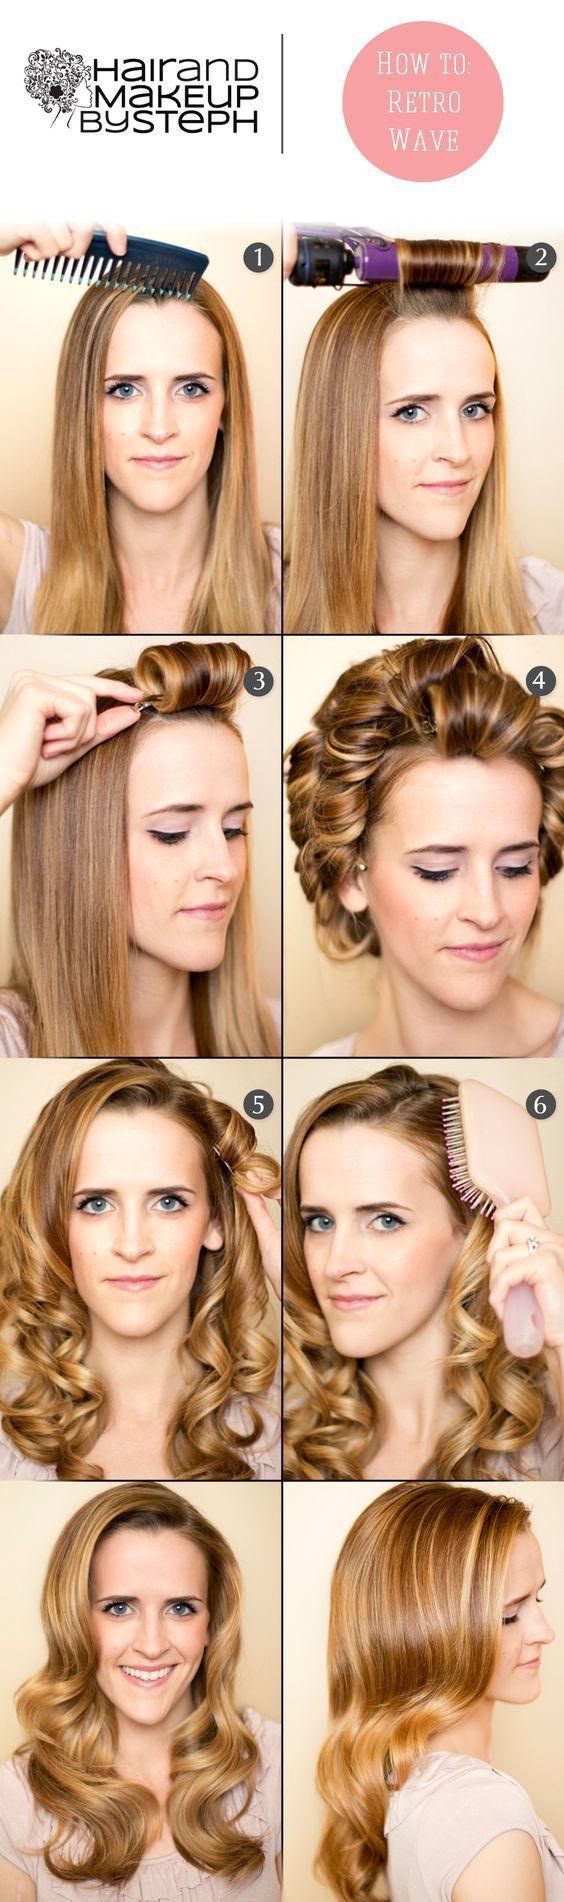 проста ретро зачіска